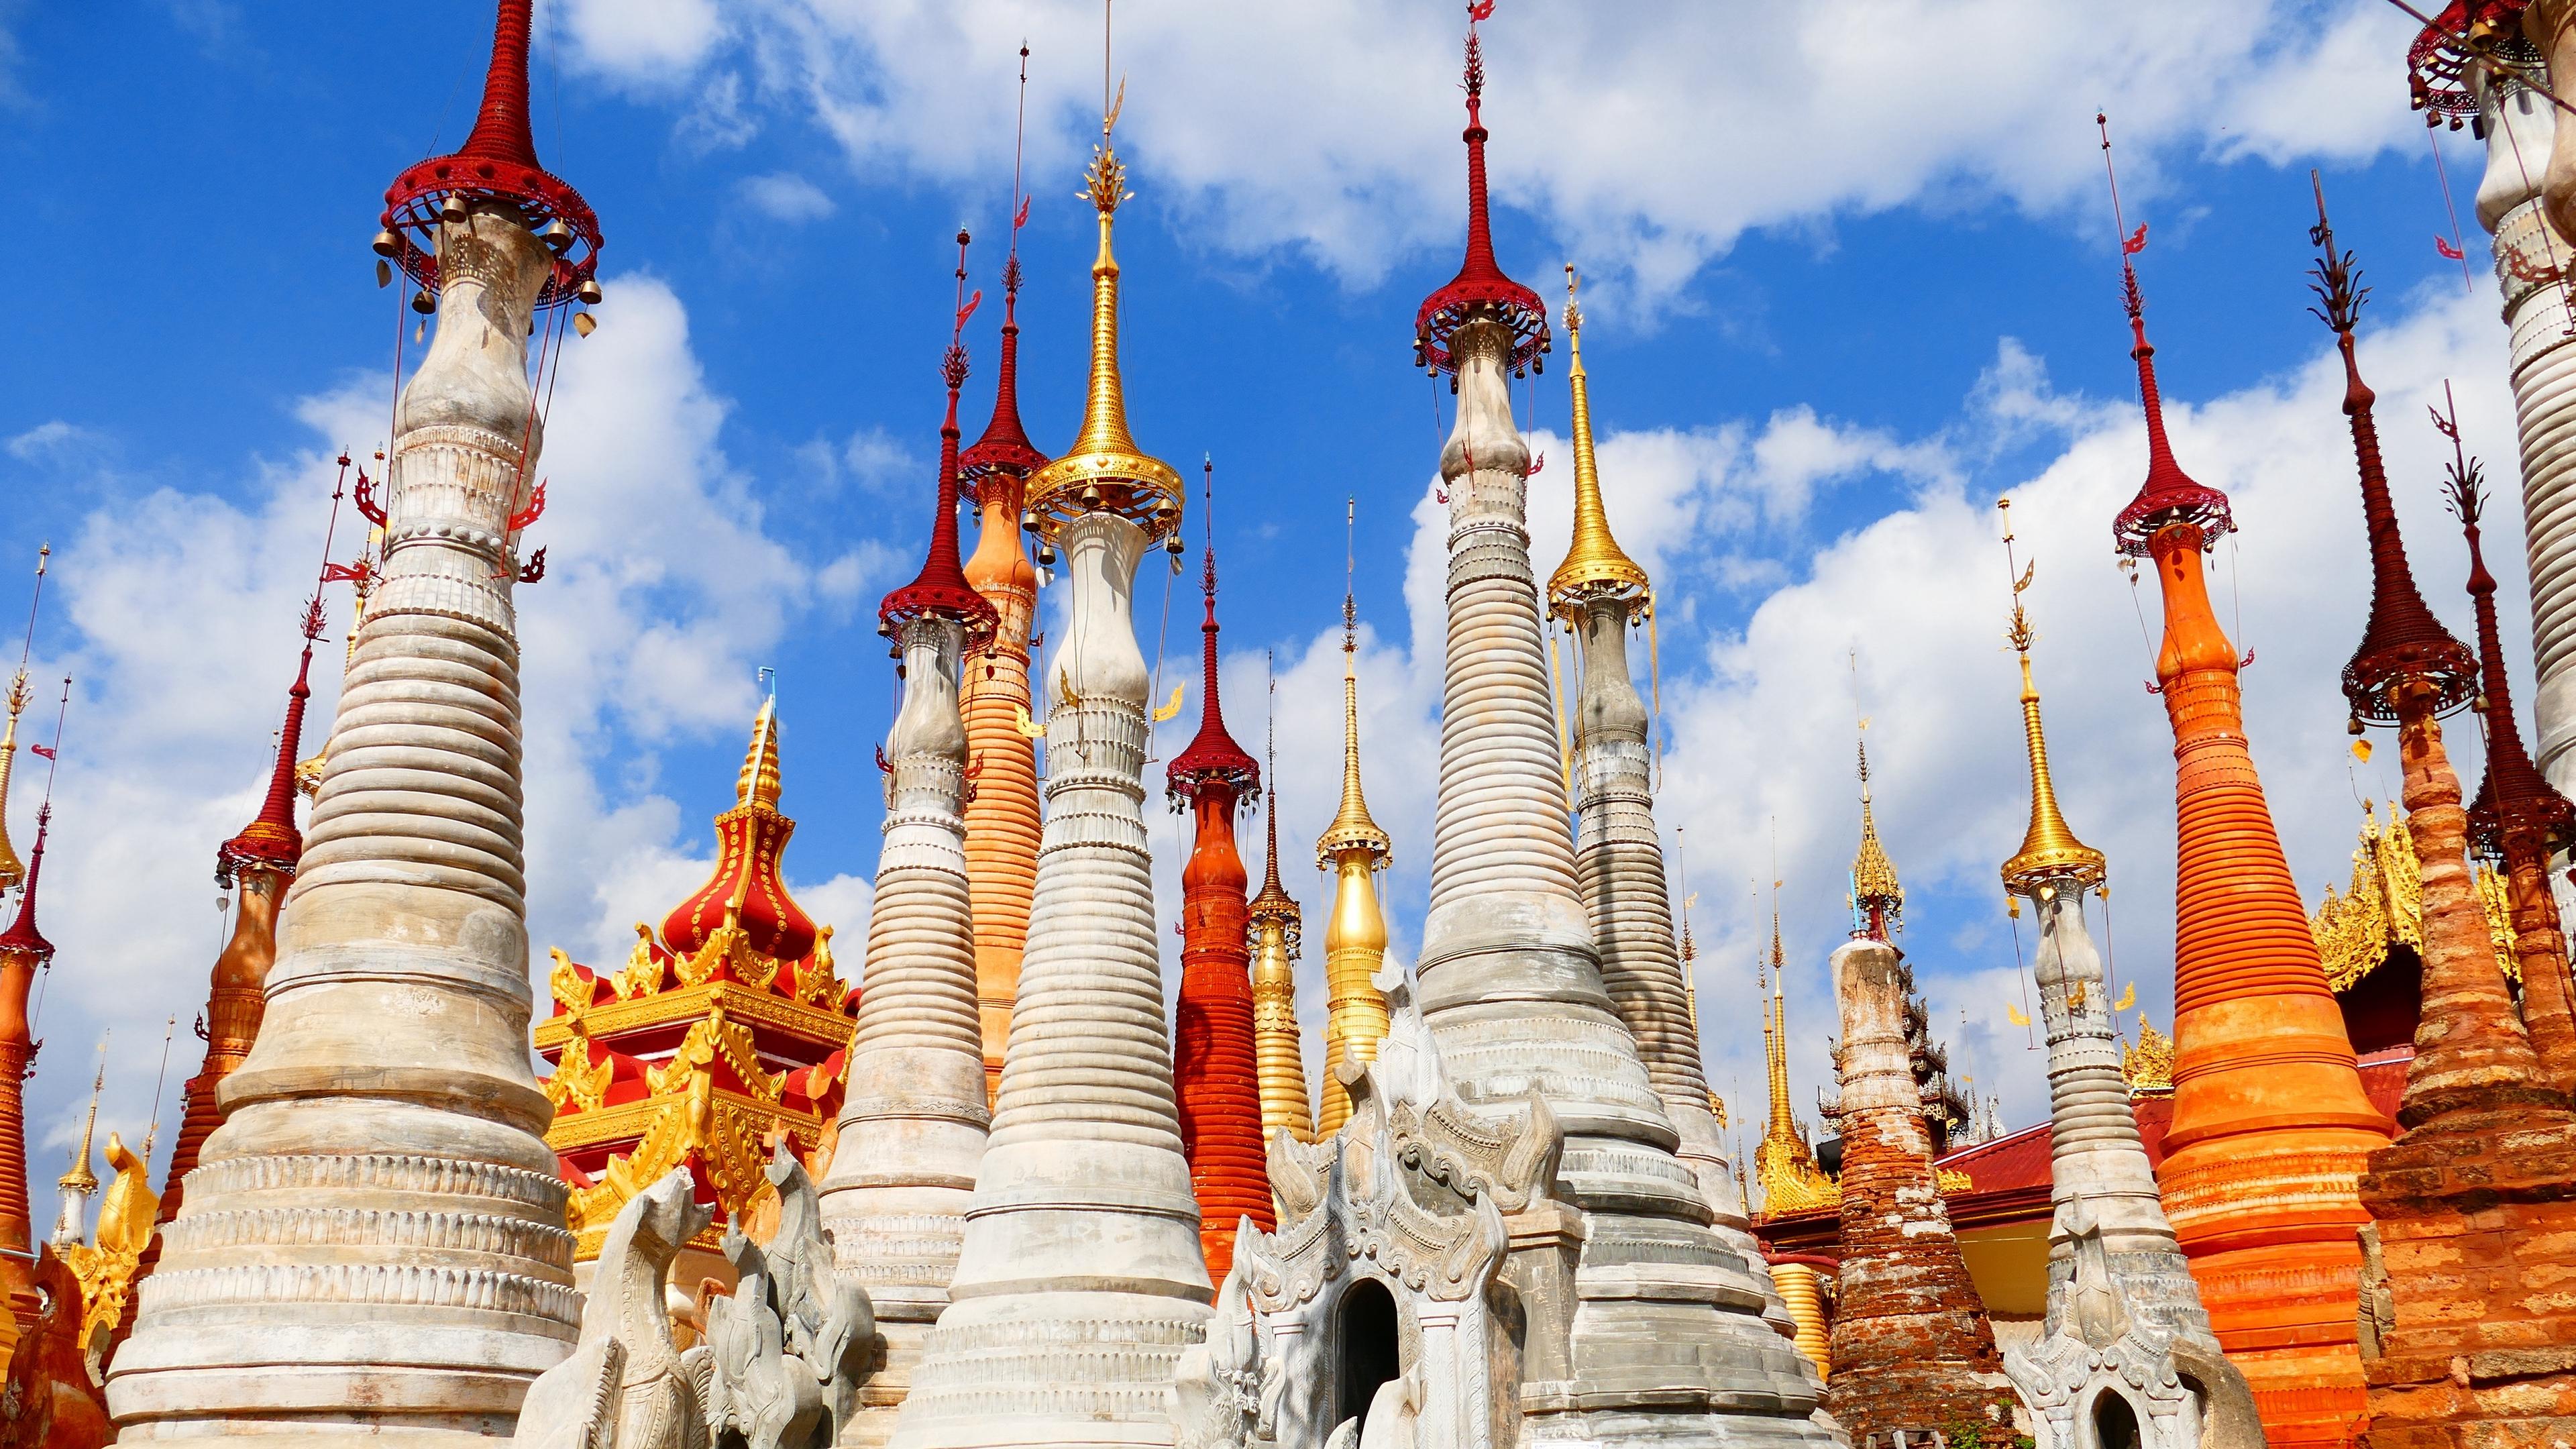 buildings myanmar burma pagoda architecture temple 4k 1538065424 - buildings, myanmar, burma, pagoda, architecture, temple 4k - myanmar, burma, buildings